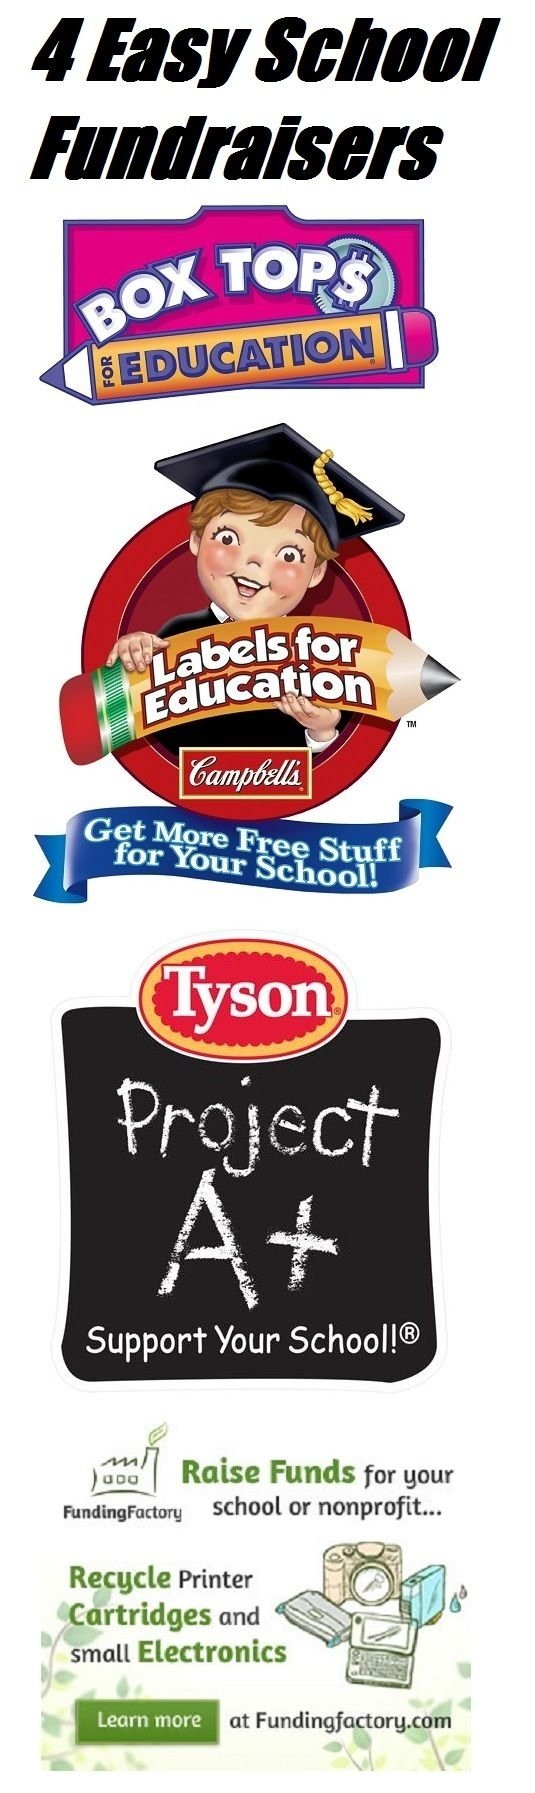 10 Gorgeous High School Creative Fundraising Ideas 169 best school fundraising ideas images on pinterest school 7